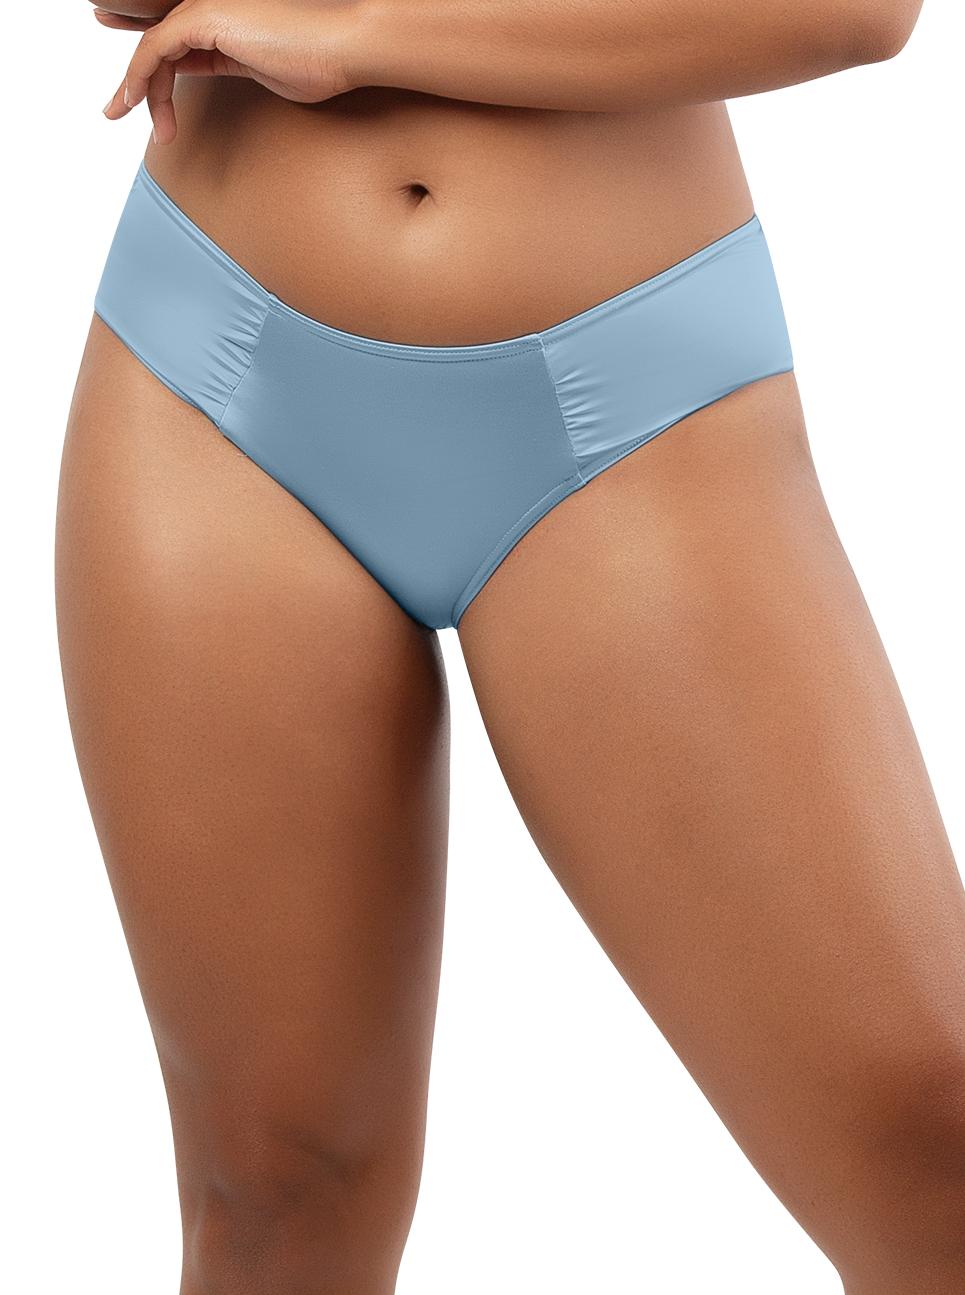 PARFAIT Rita Bikini BottomS8143 DreamBlue Front1 - Rita Bikini Bottom Dream Blue S8143